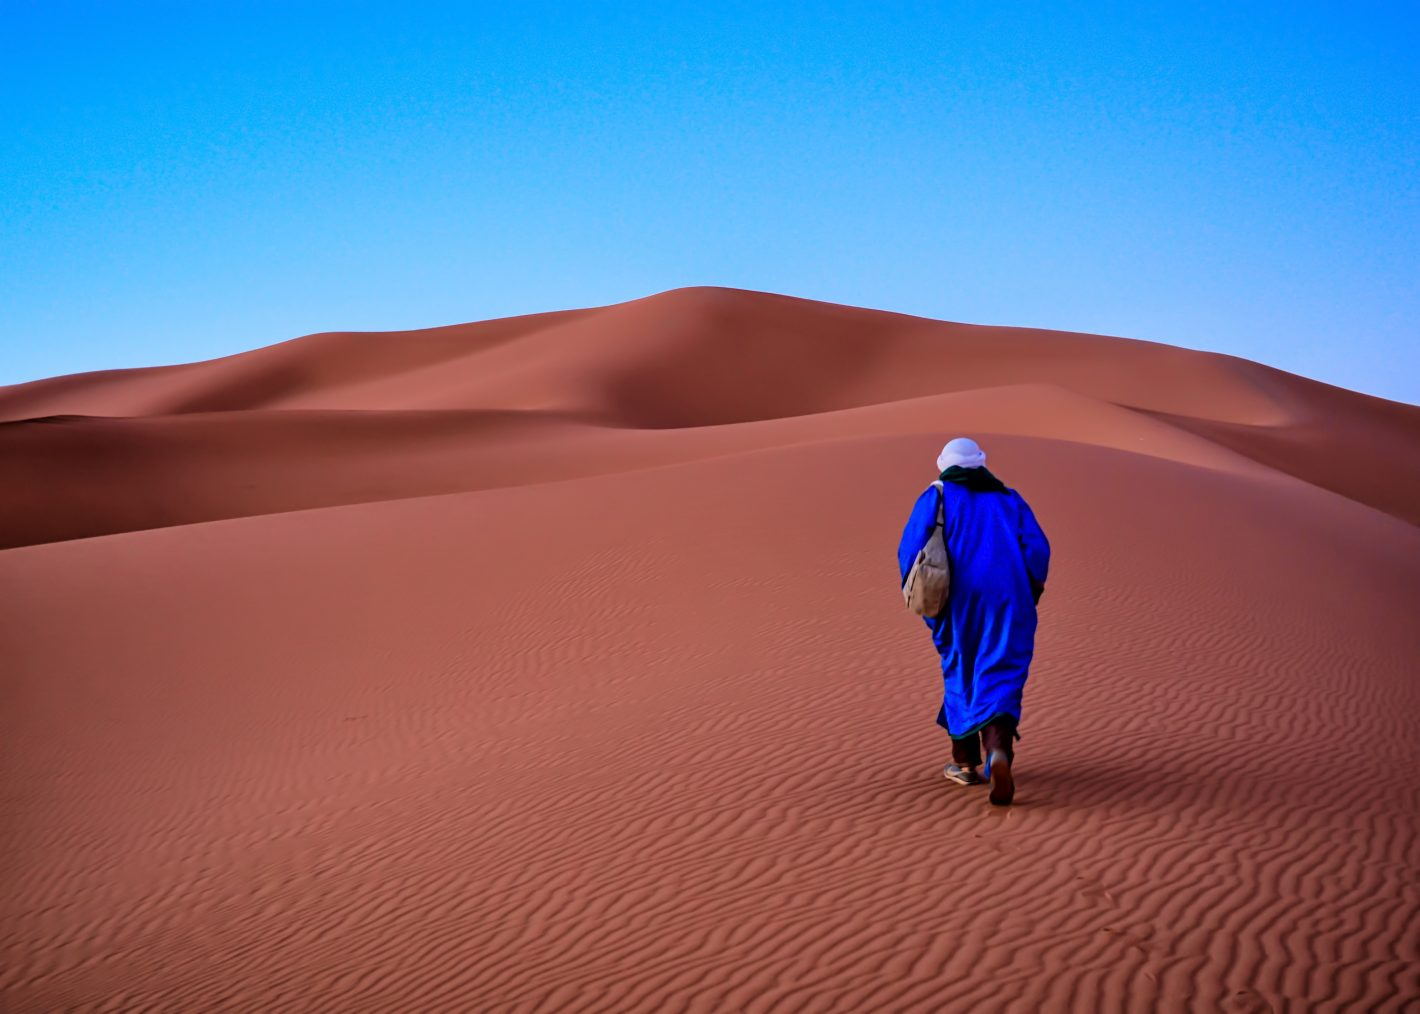 Morroco -Cyrus Javis_Man and Sand Dune